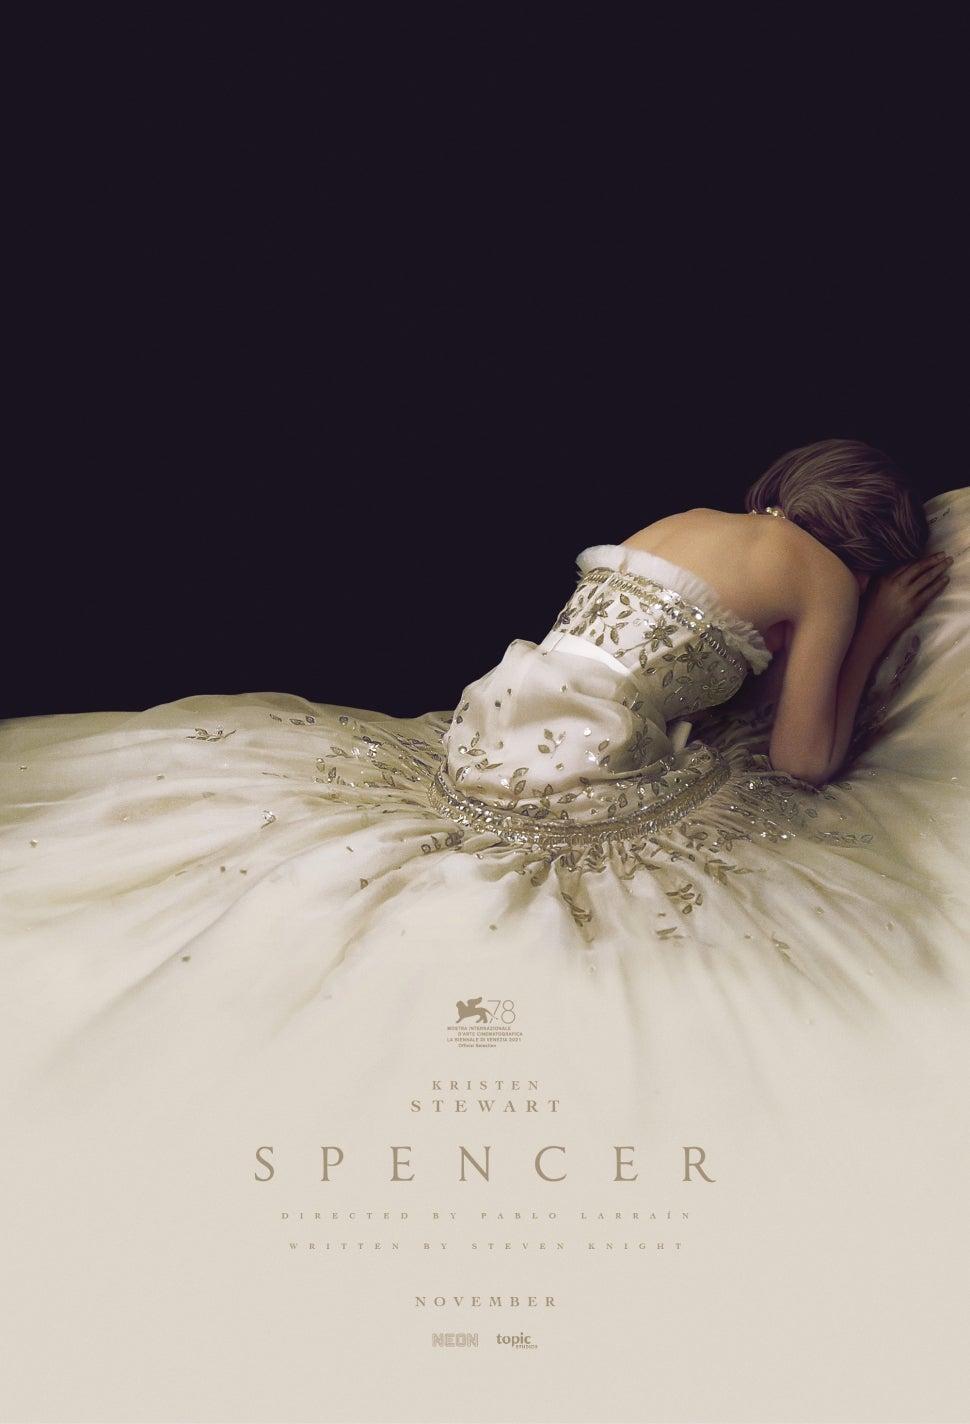 'Spencer' movie poster